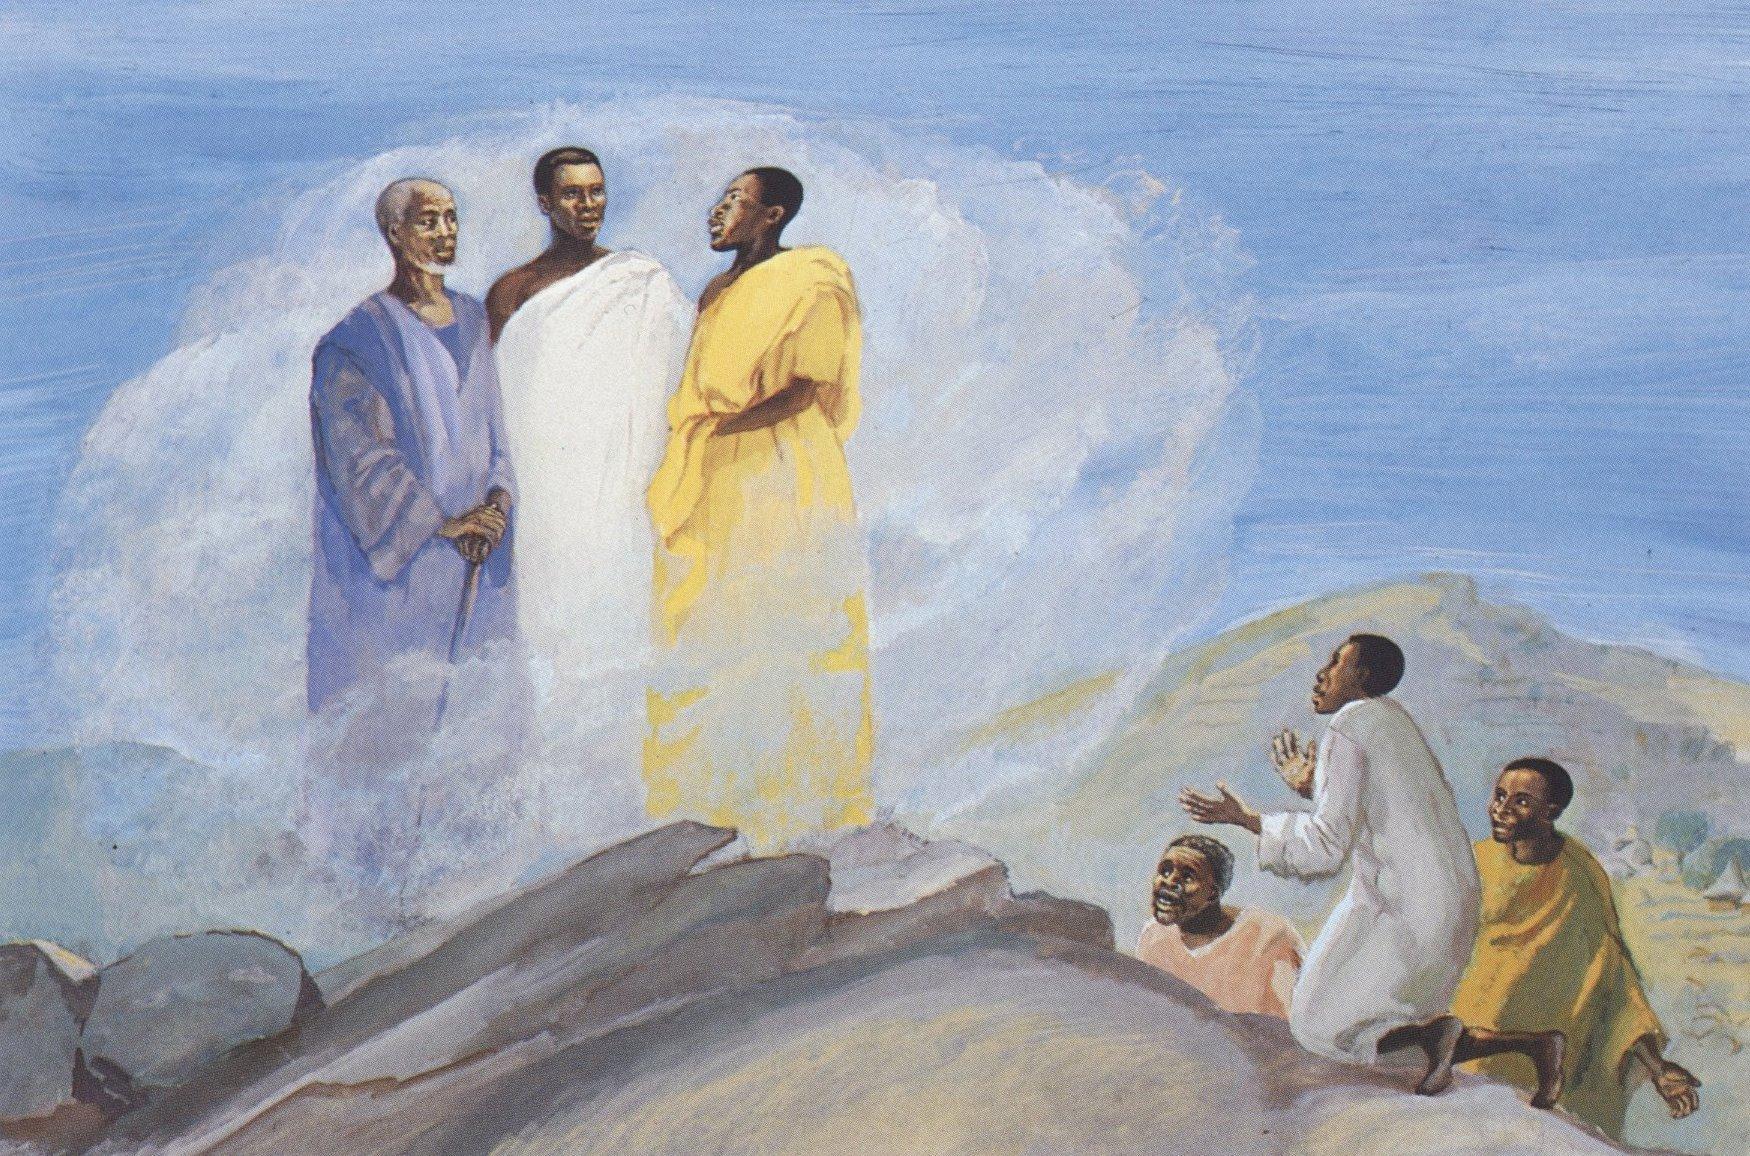 JESUS MAFA. Transfiguration, from  Art in the Christian Tradition , a project of the Vanderbilt Divinity Library, Nashville, TN.